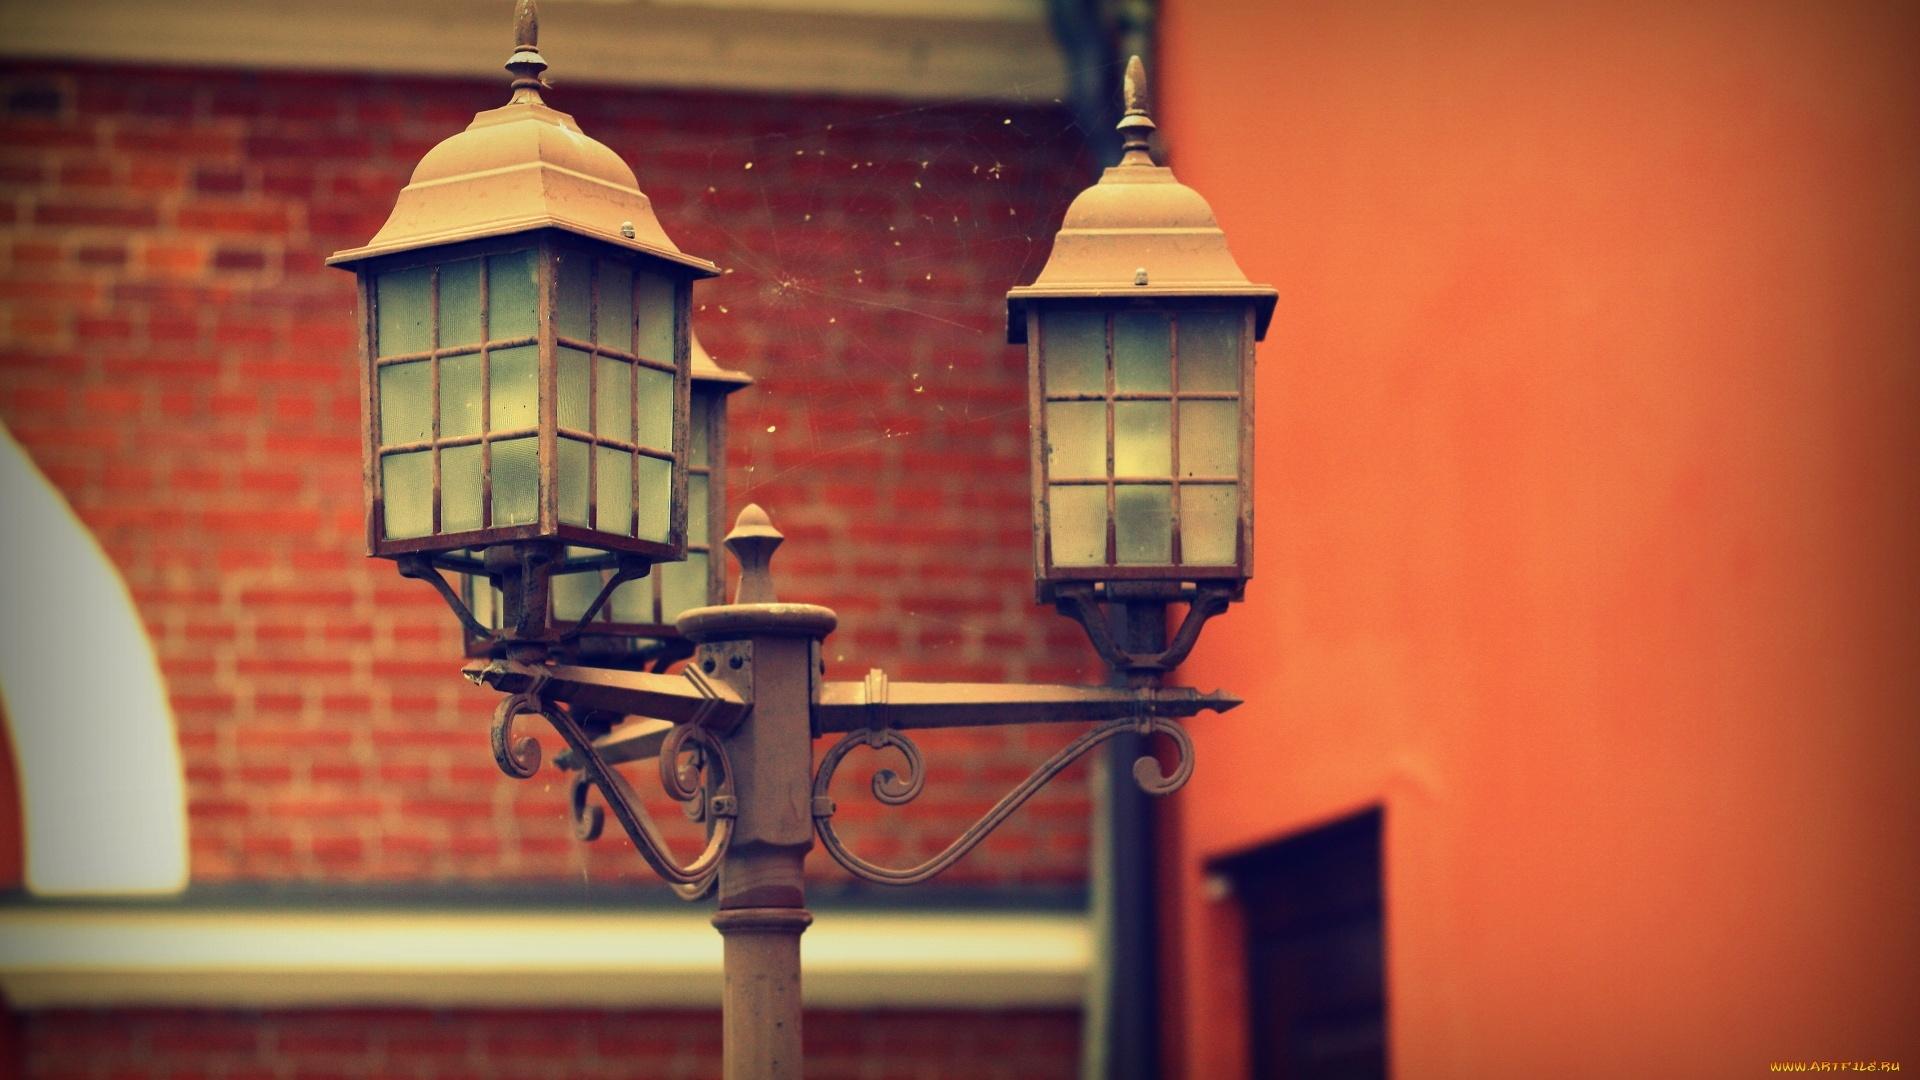 Lantern wallpaper for pc